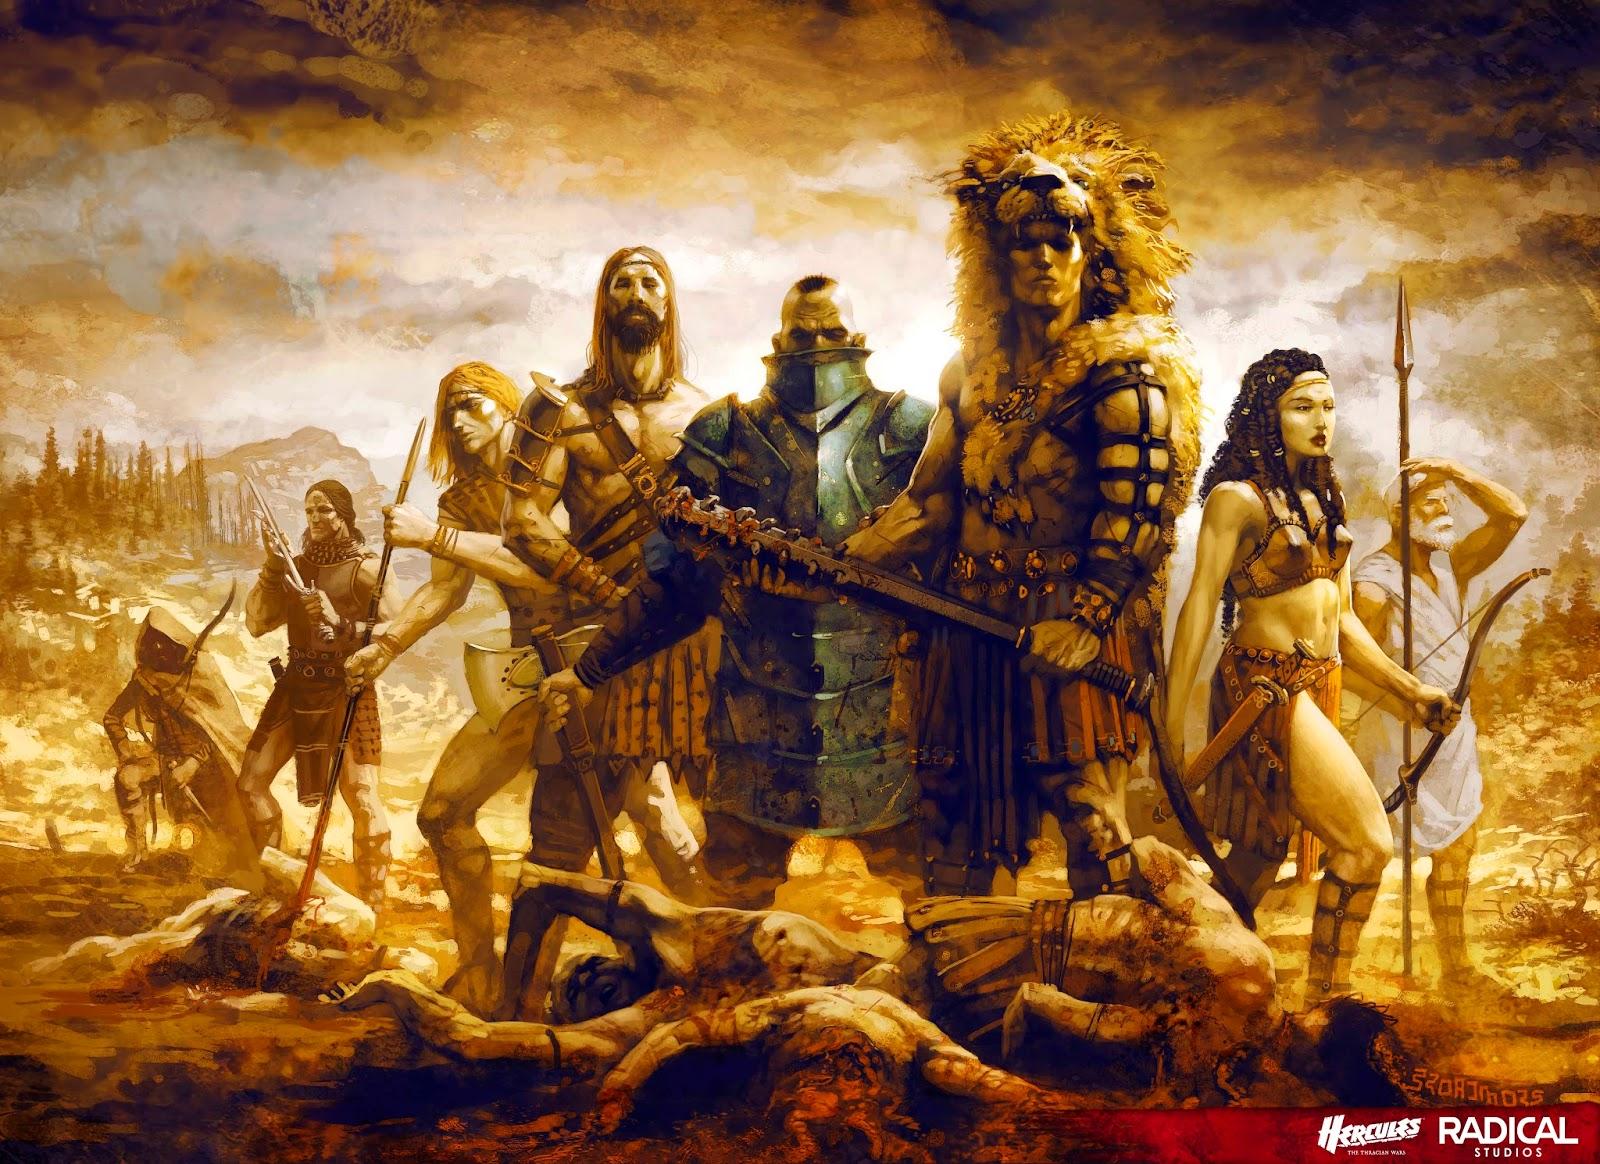 Hercules Retina Movie Wallpaper: Hércules 2014